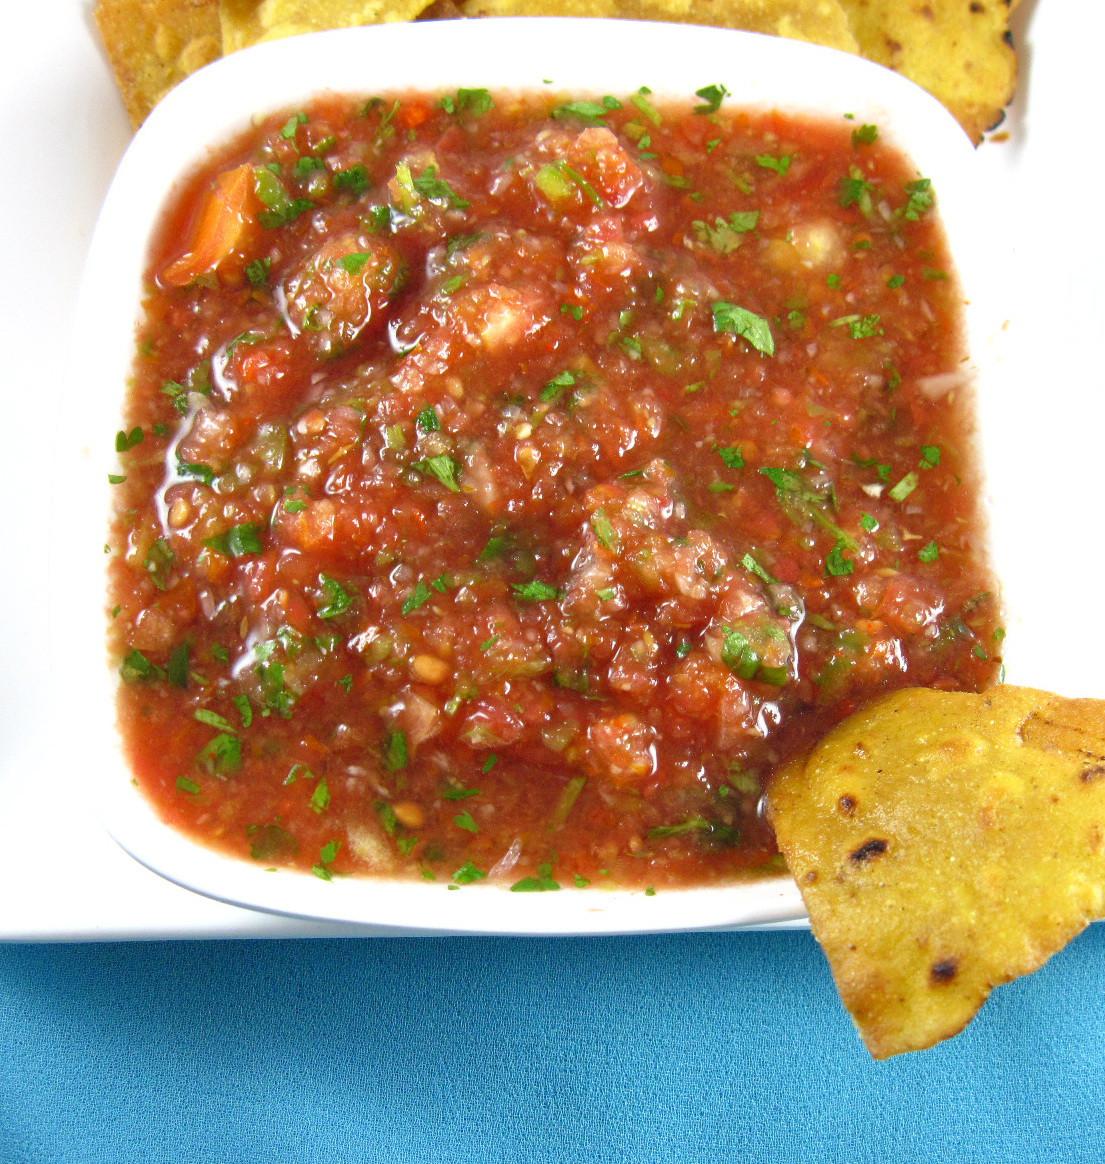 Mexican Restaurant Salsa Recipe  Homemade Salsa Recipe Mexican Restaurant Style